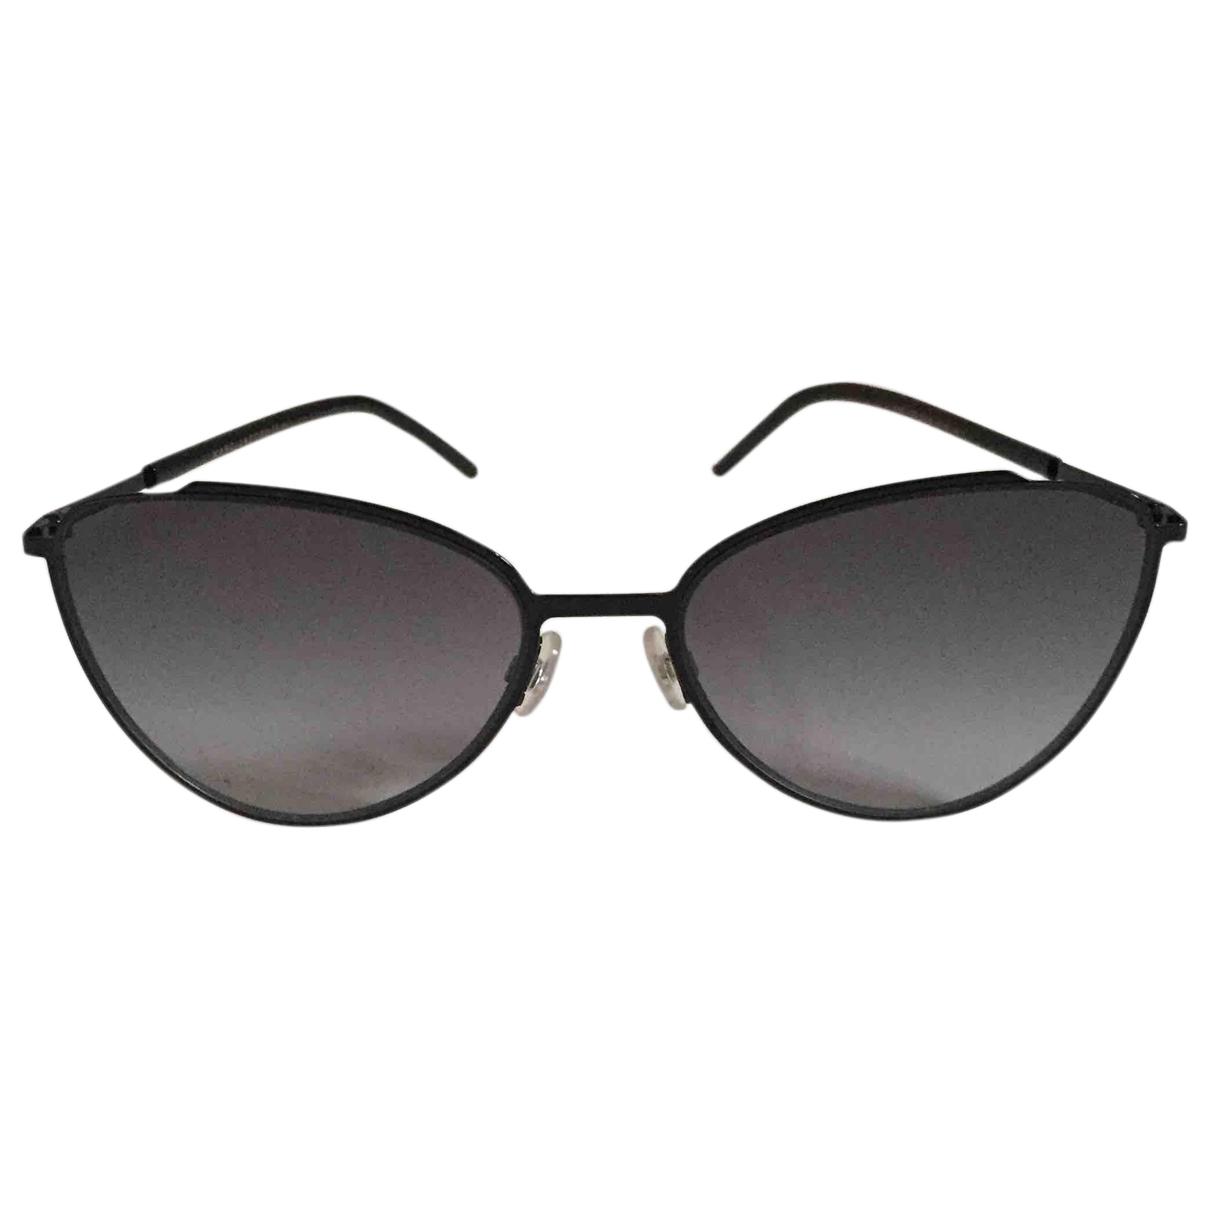 Marc Jacobs \N Sonnenbrillen in  Schwarz Metall